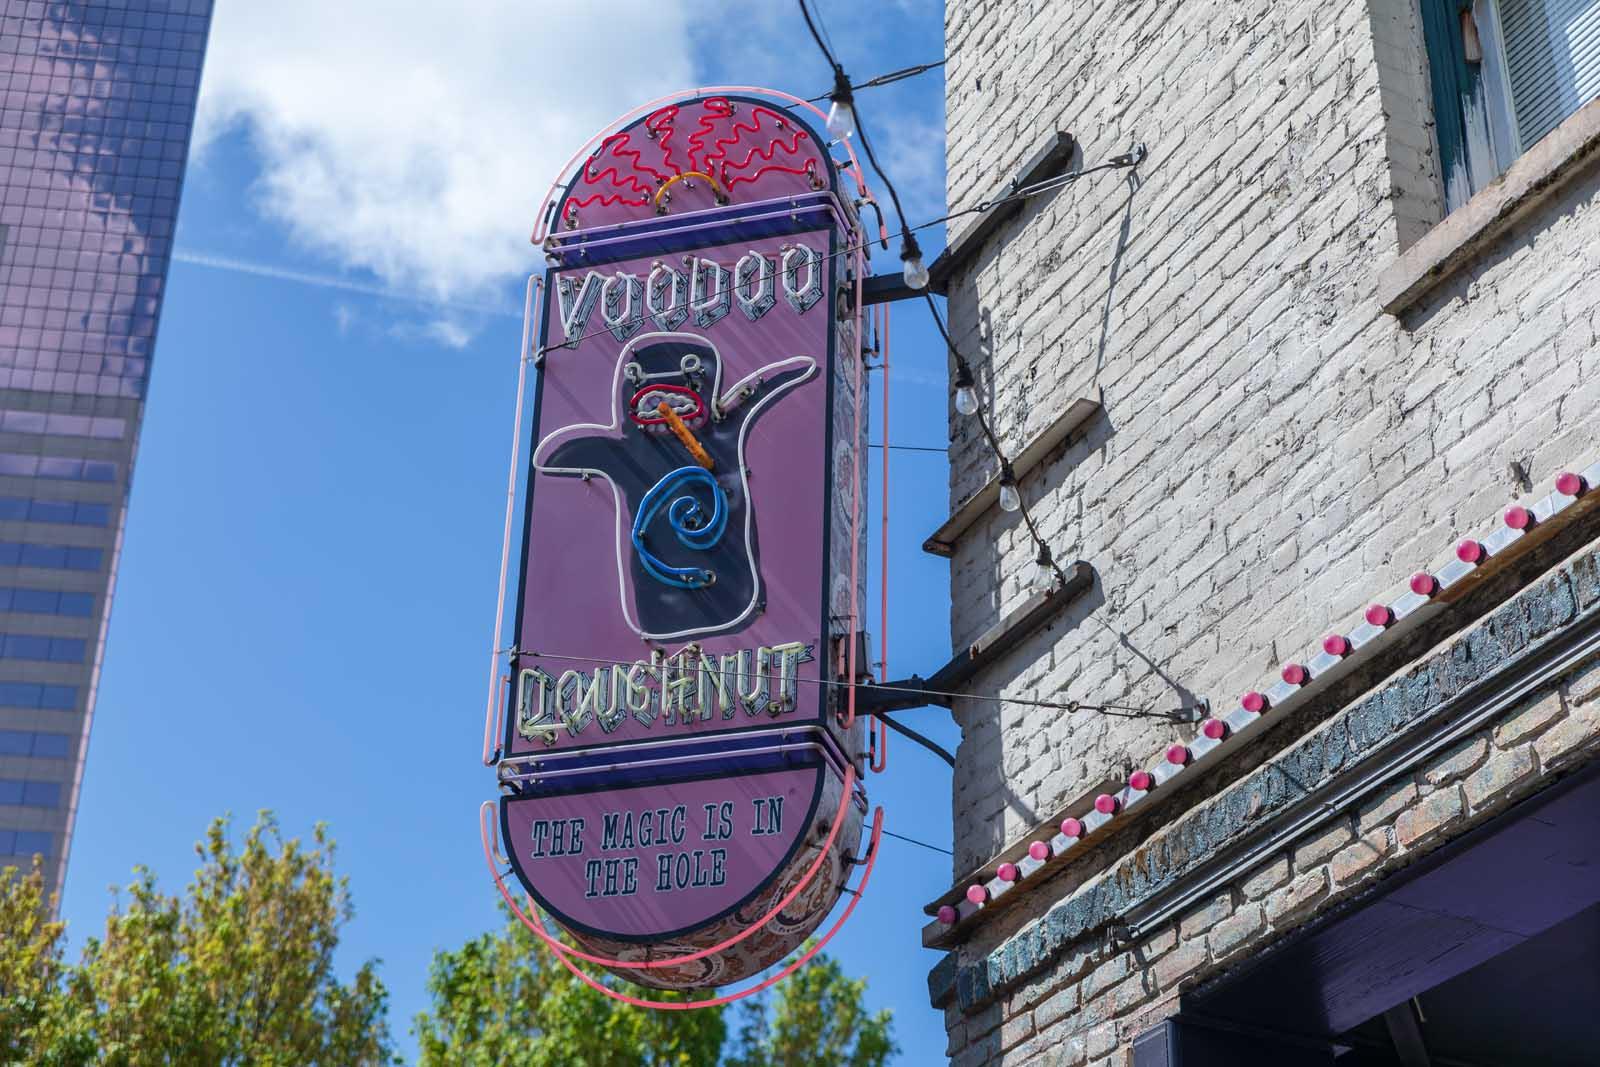 Voodoo Doughnut in Portland Oregon